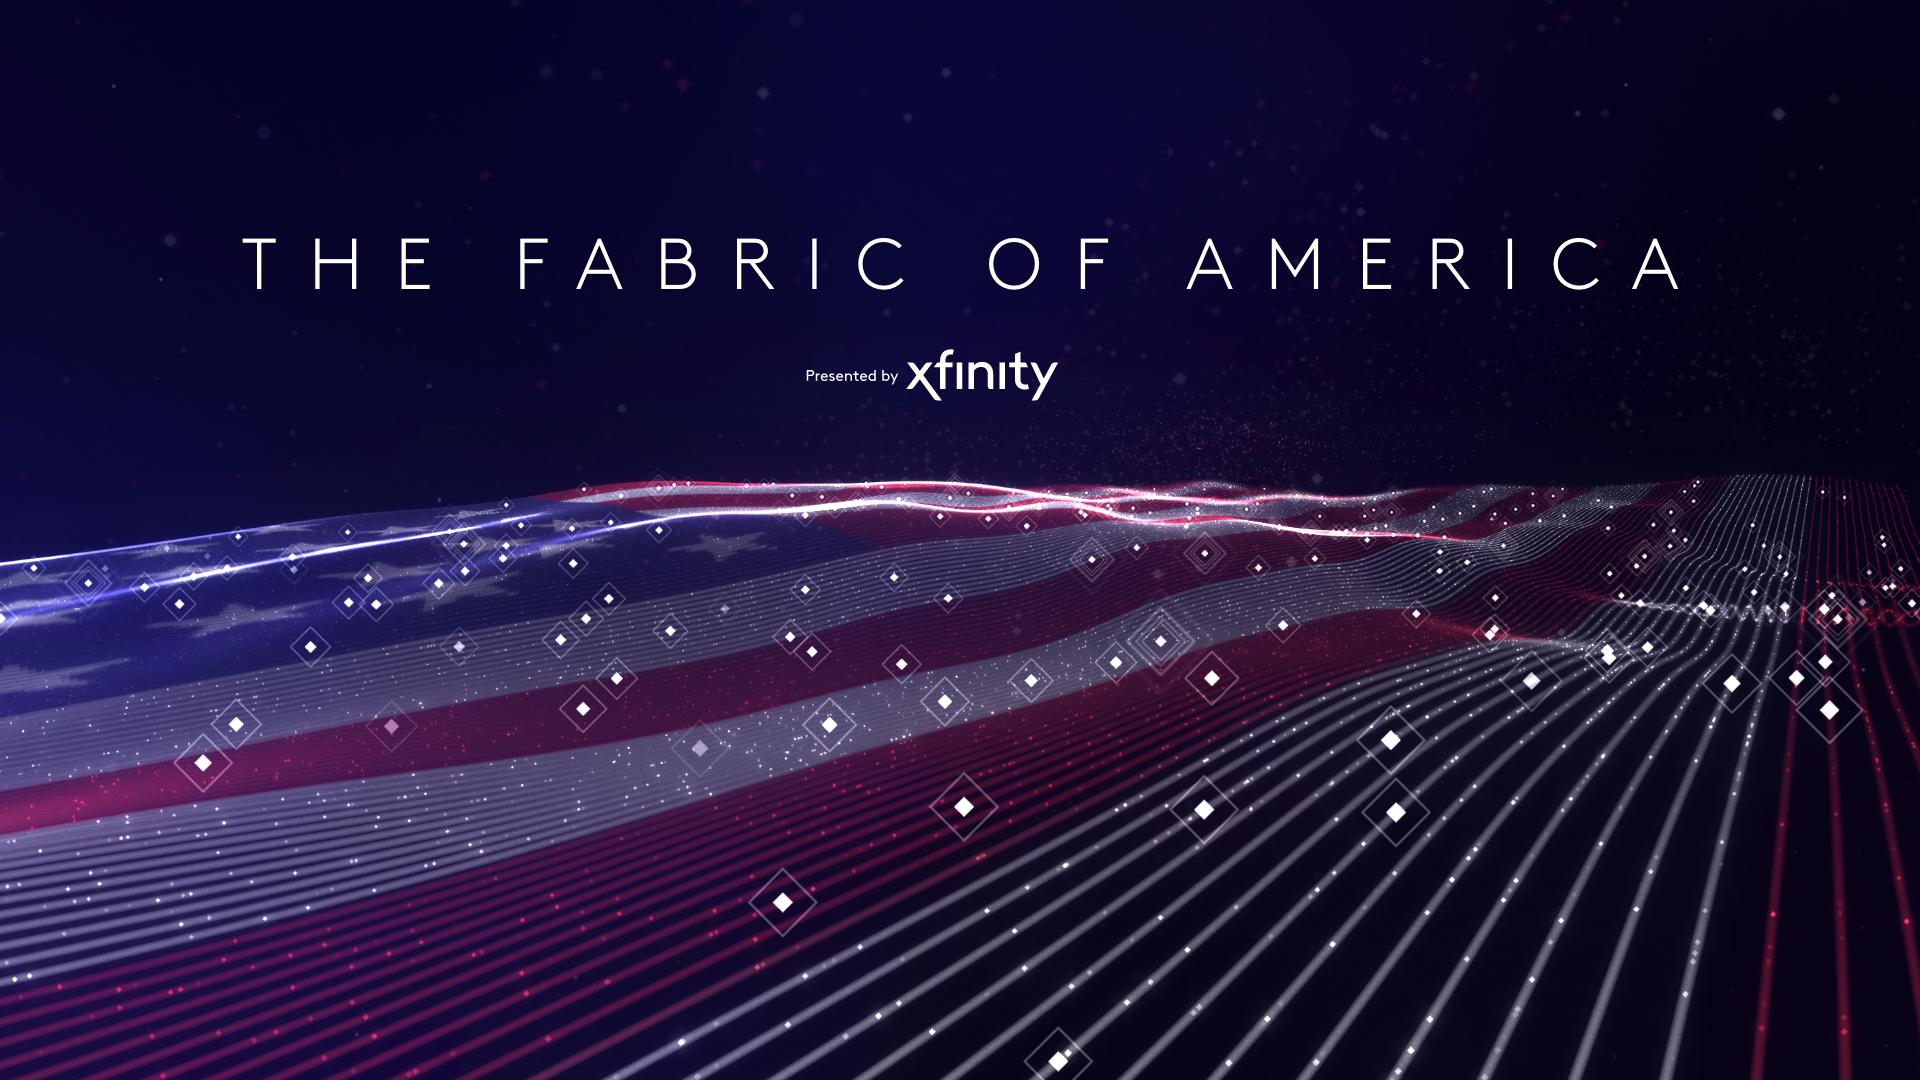 Xfinity'sThe Fabric of America